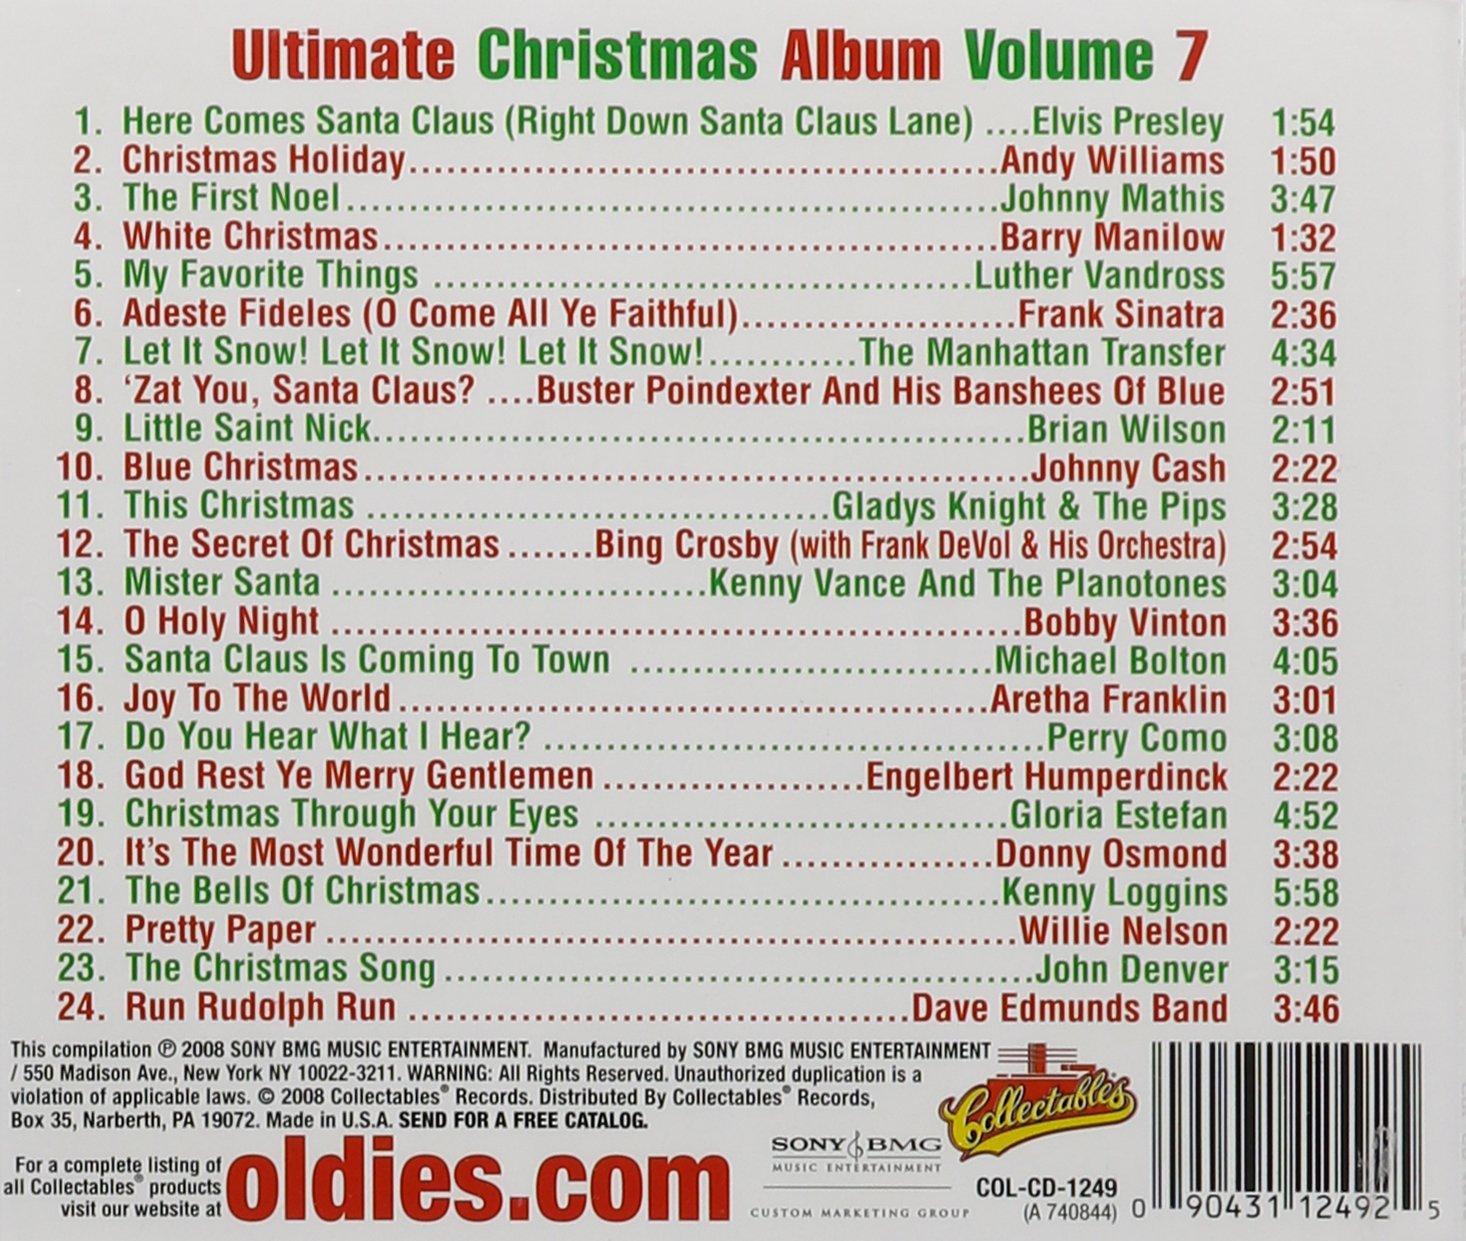 VARIOUS ARTISTS - Ultimate Christmas Album, Vol. 7: WCBS FM 101.1 ...